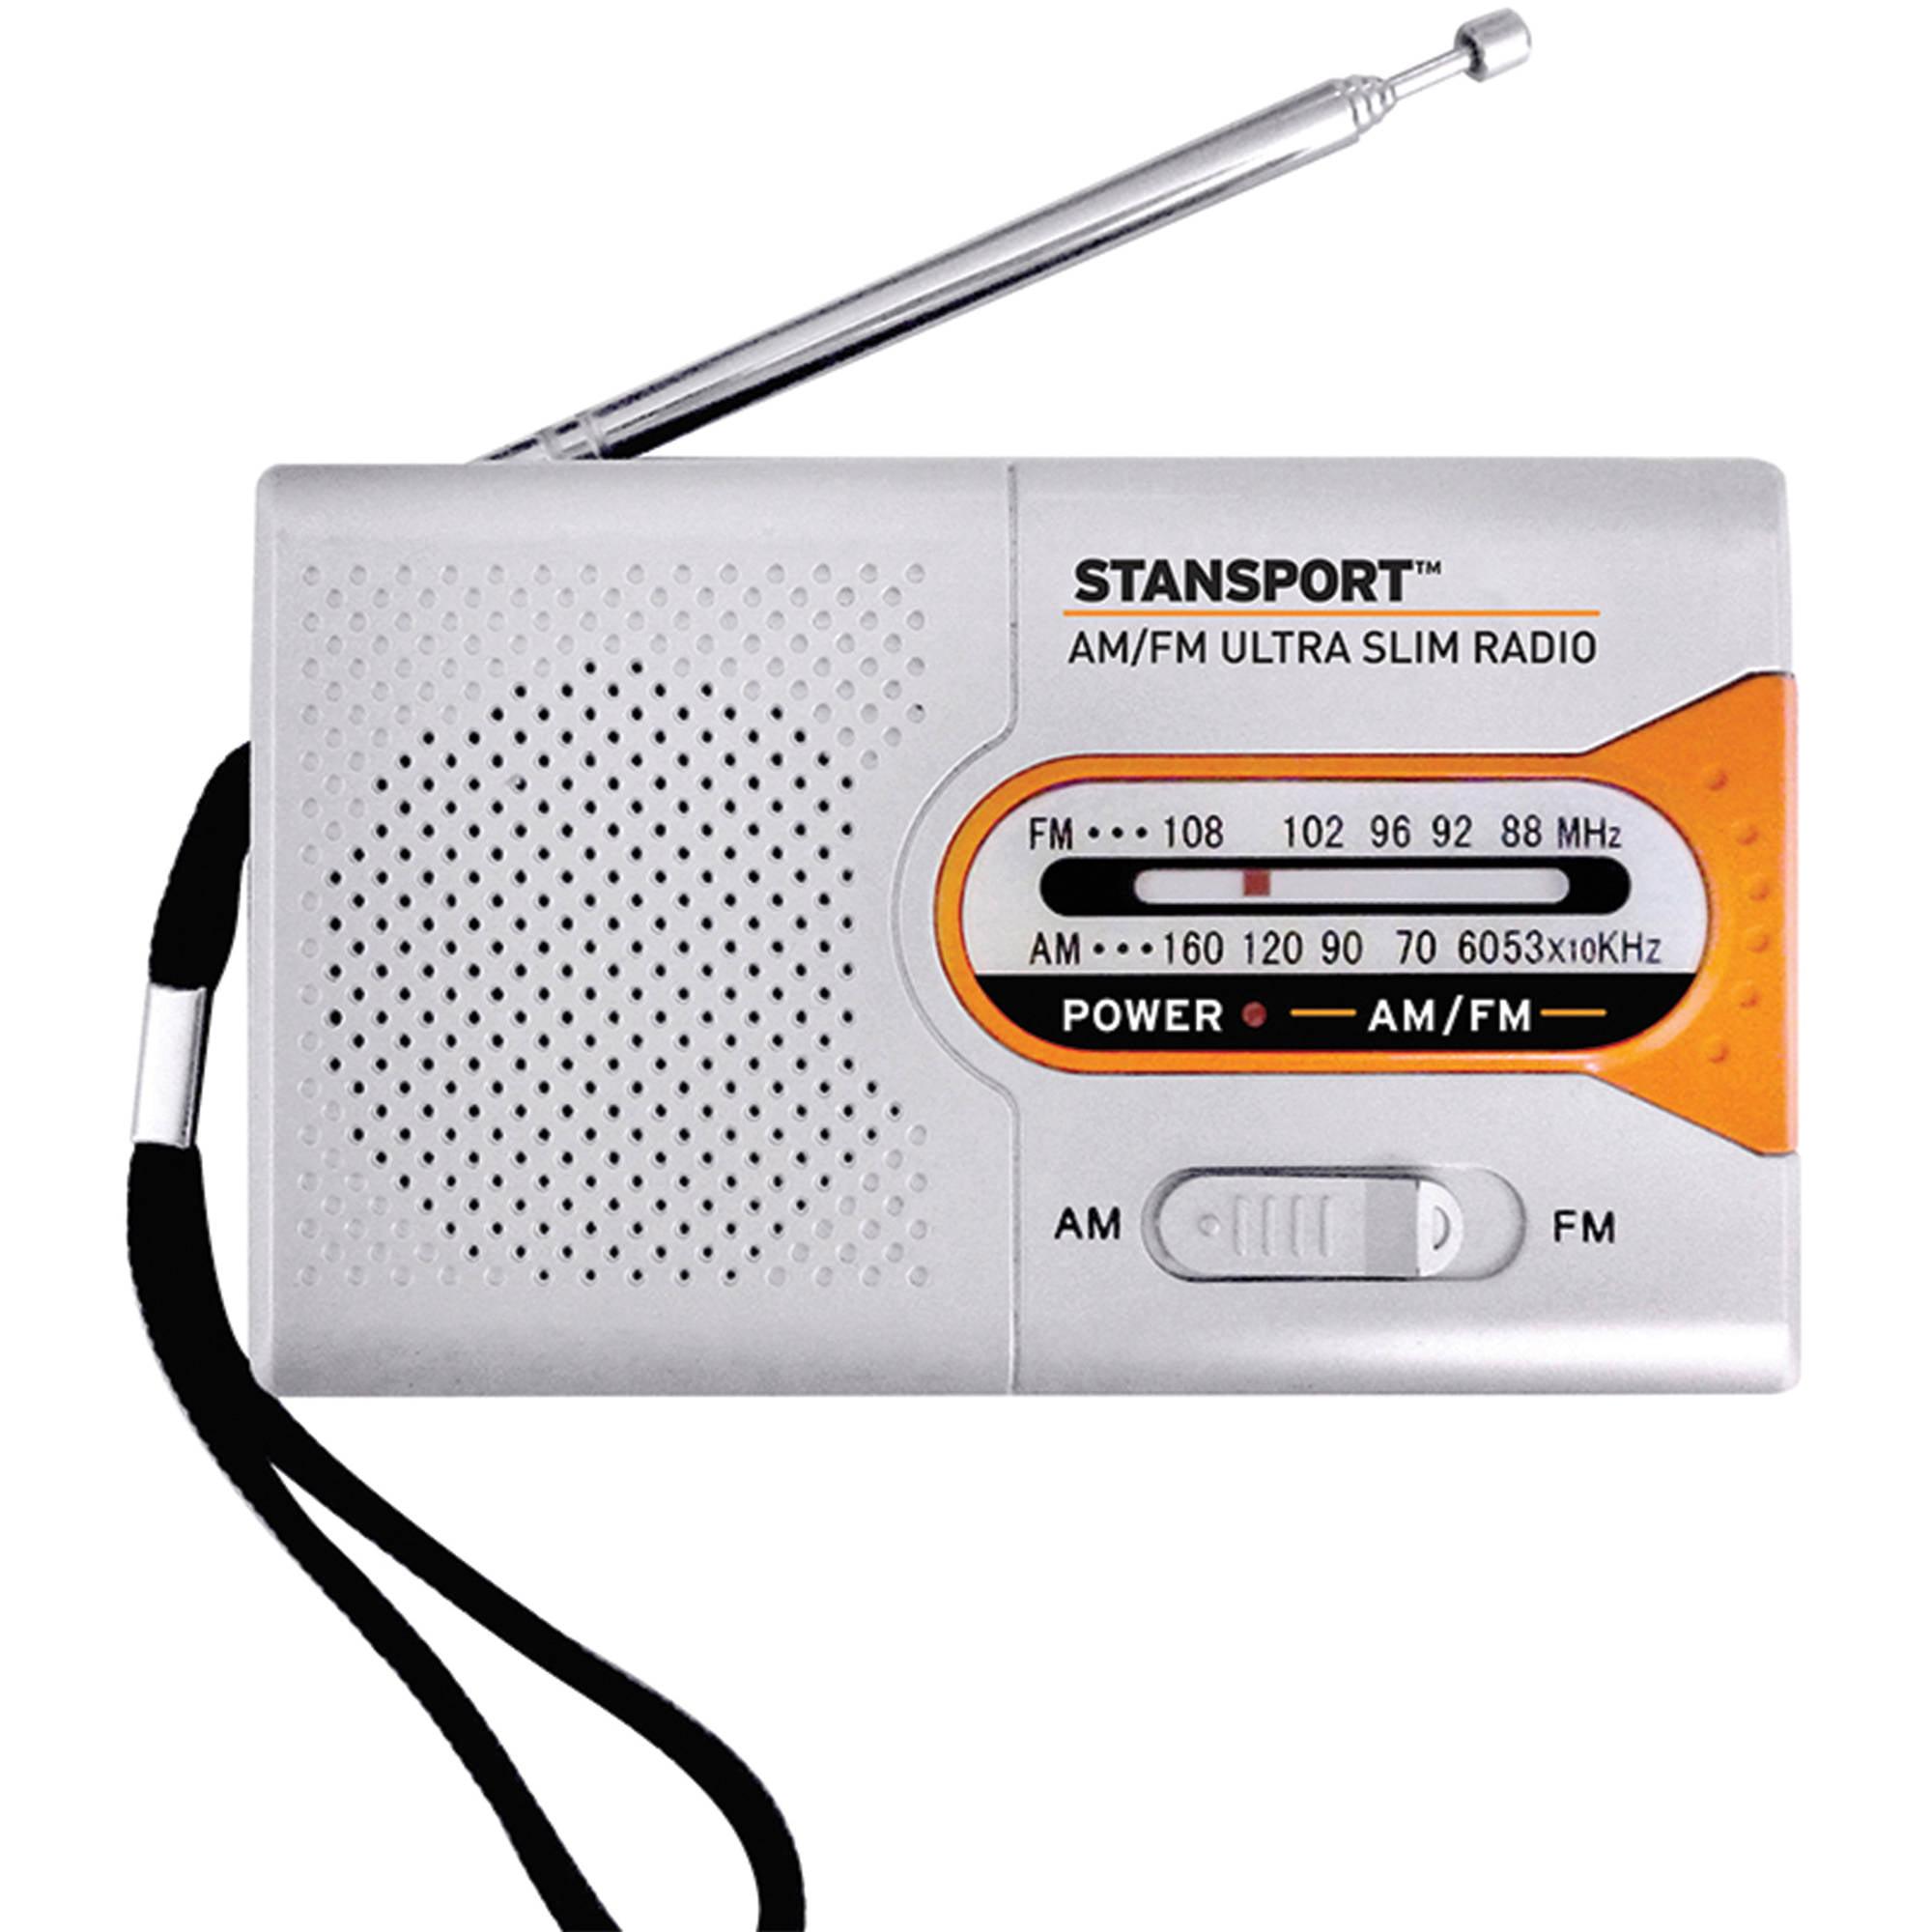 Stansport Emergency AM FM Radio by